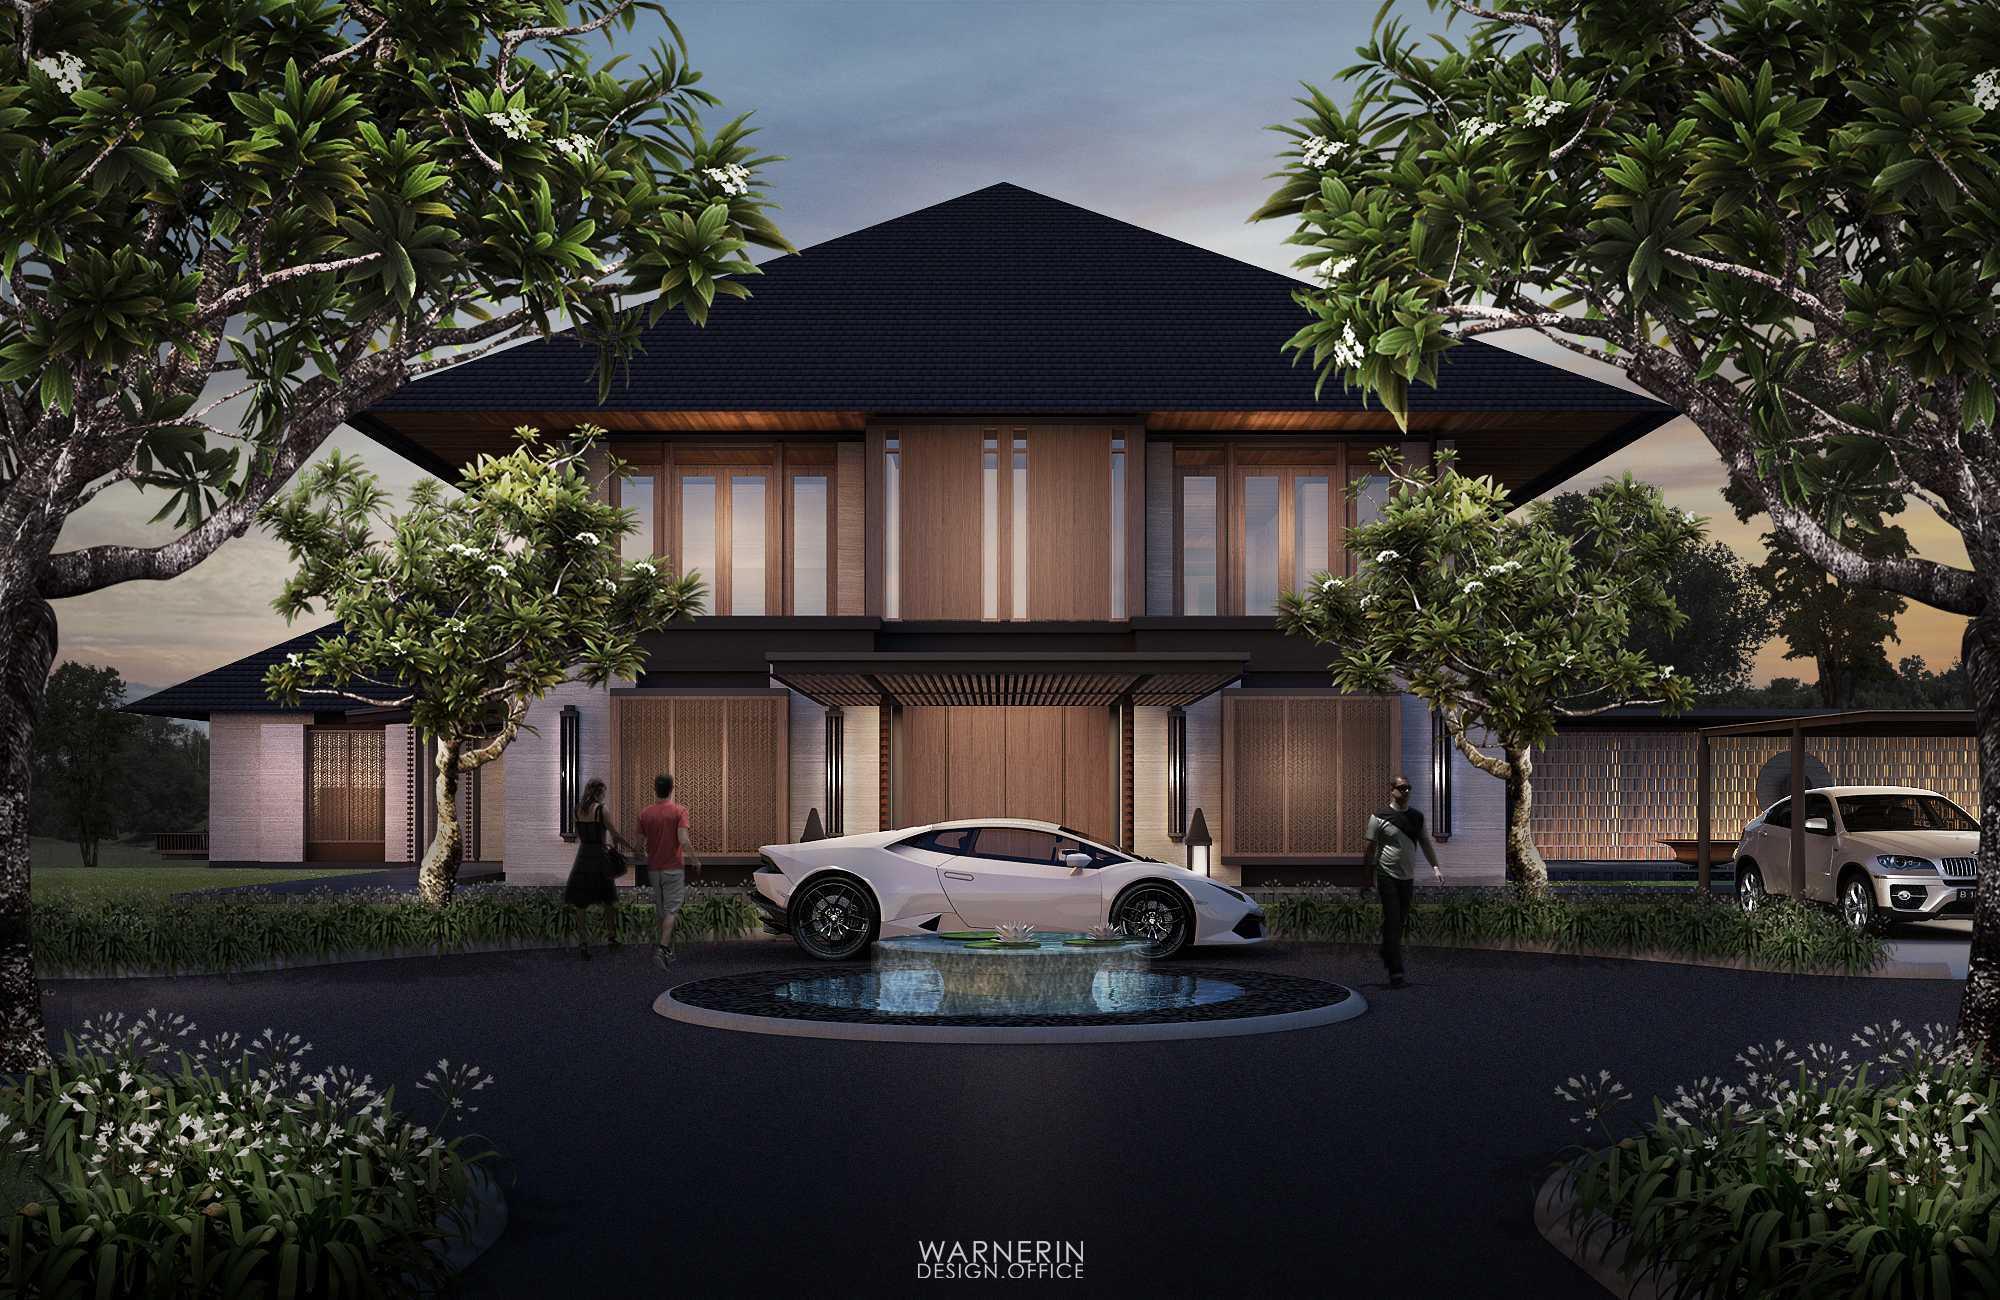 Warnerin Design Office Villa At Java Bandung, Bandung City, West Java, Indonesia  V01C-Wdo Modern,tropis  35551